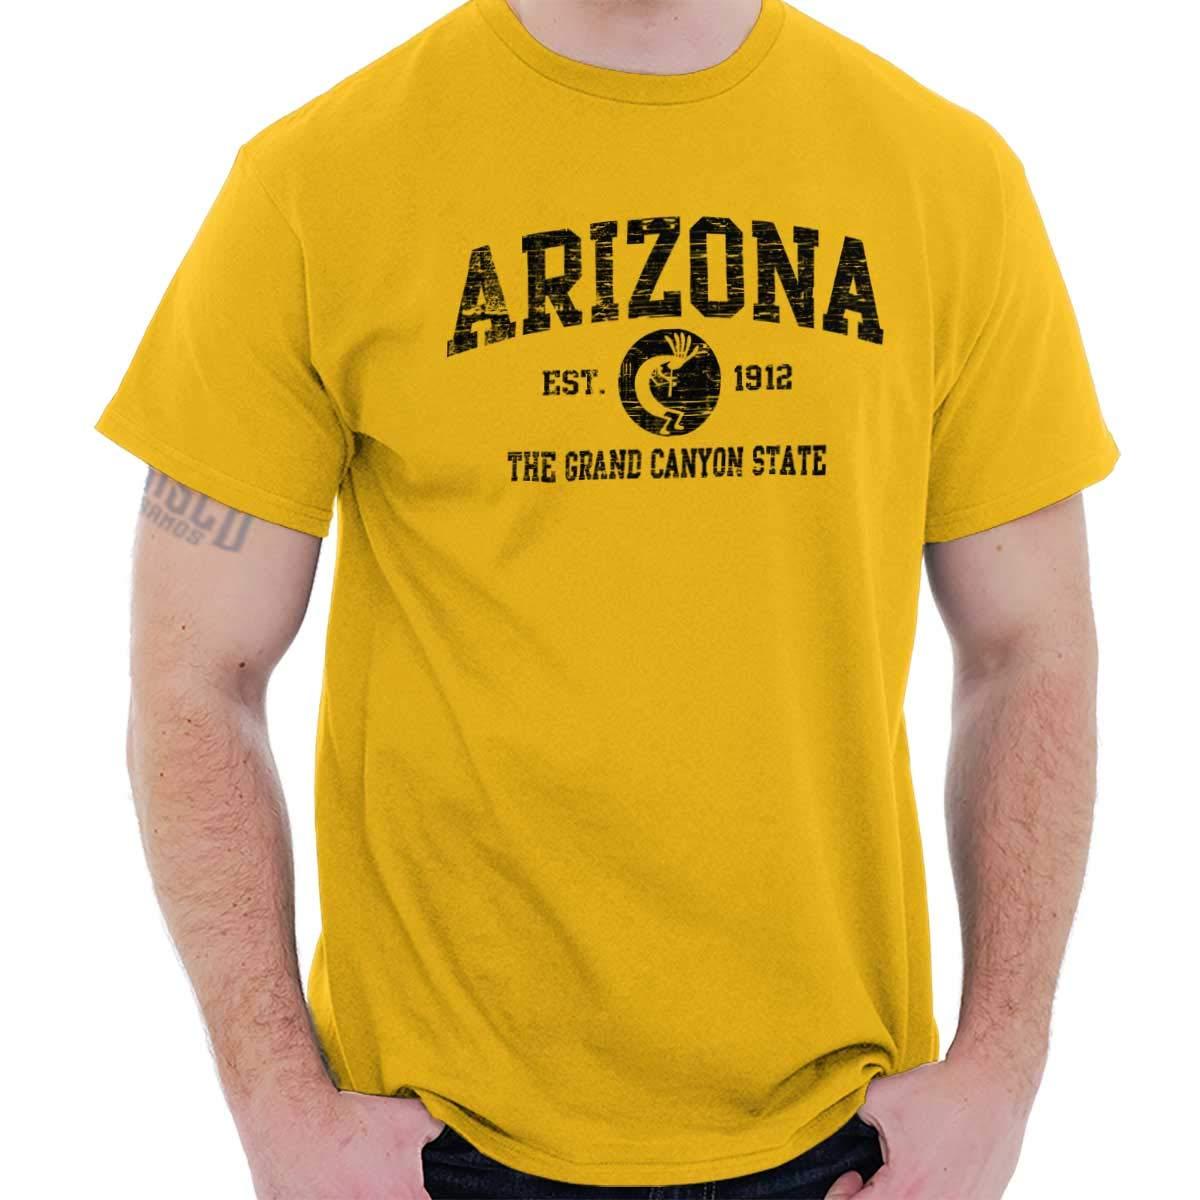 Arizona State Vintage Est Retro Hometown T Shirt Tee 1937